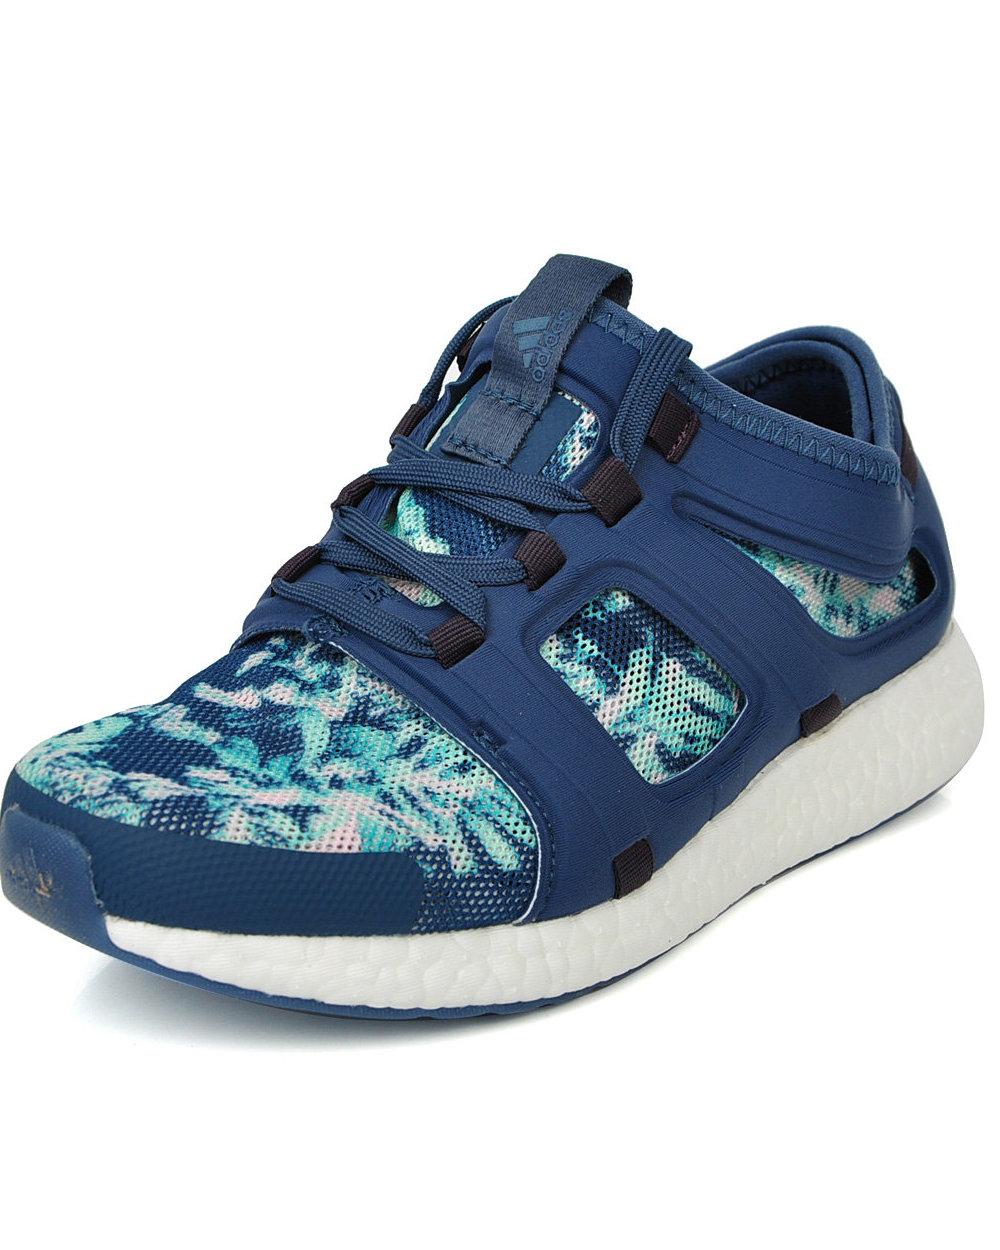 Adidas climachill blu